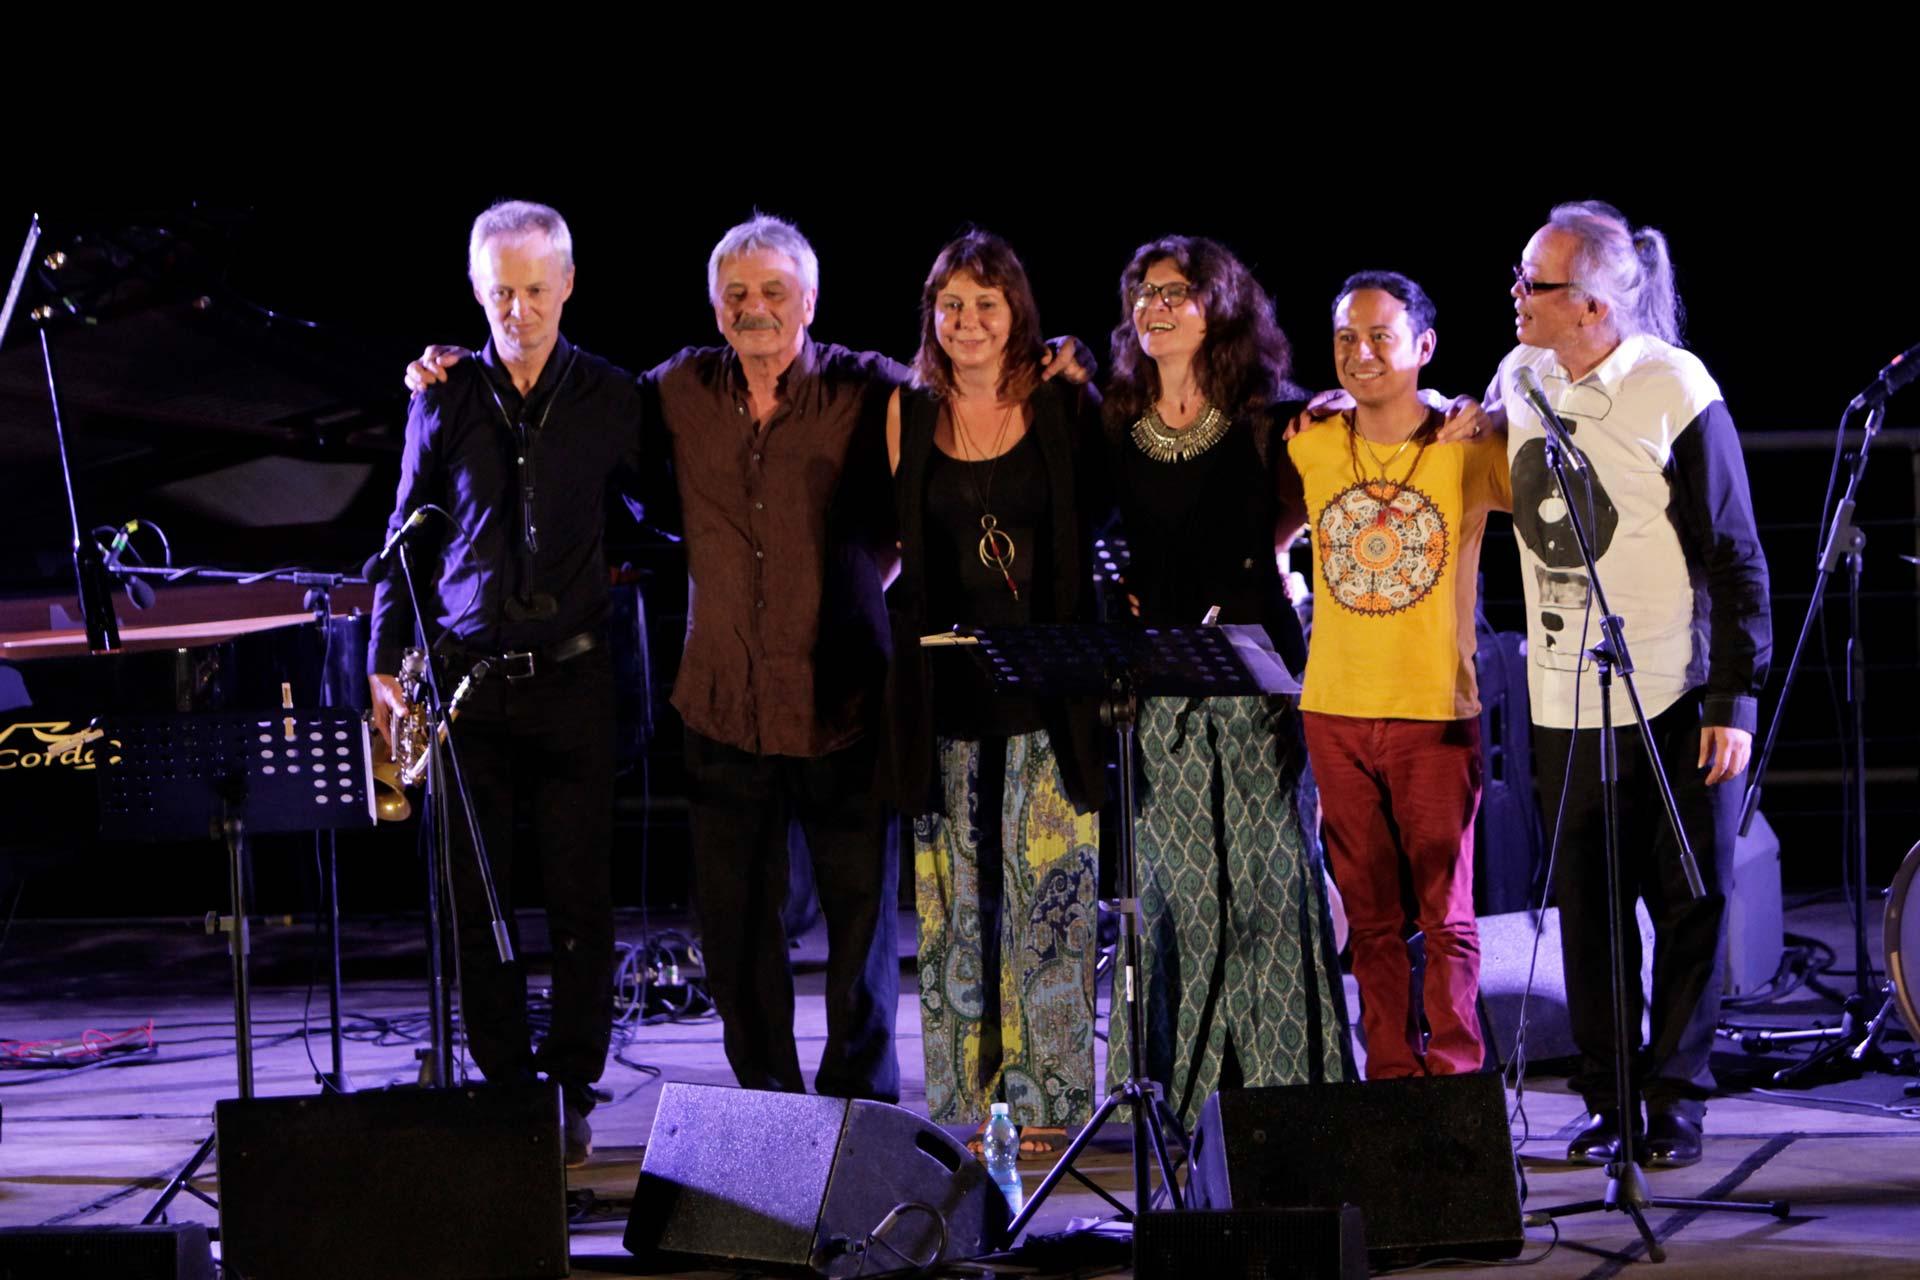 Rita Marcotulli, Nguyen Le, Maria Pia De Vito - Nora Jazz Festival 2017